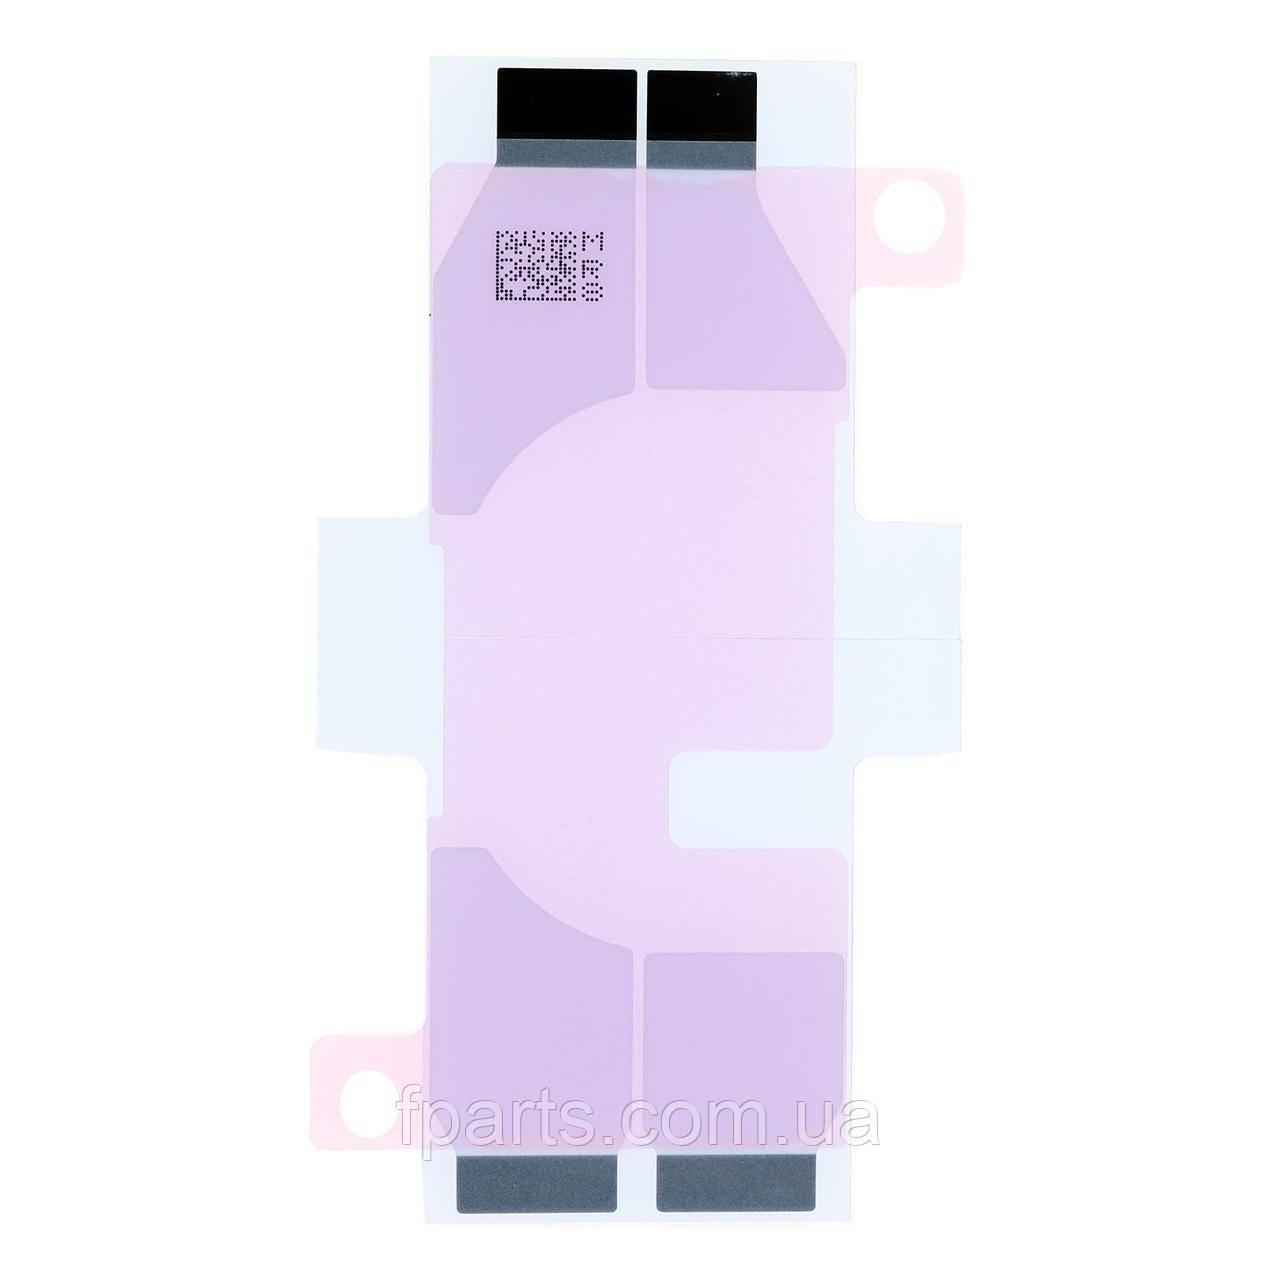 Стикер аккумулятора iPhone XR